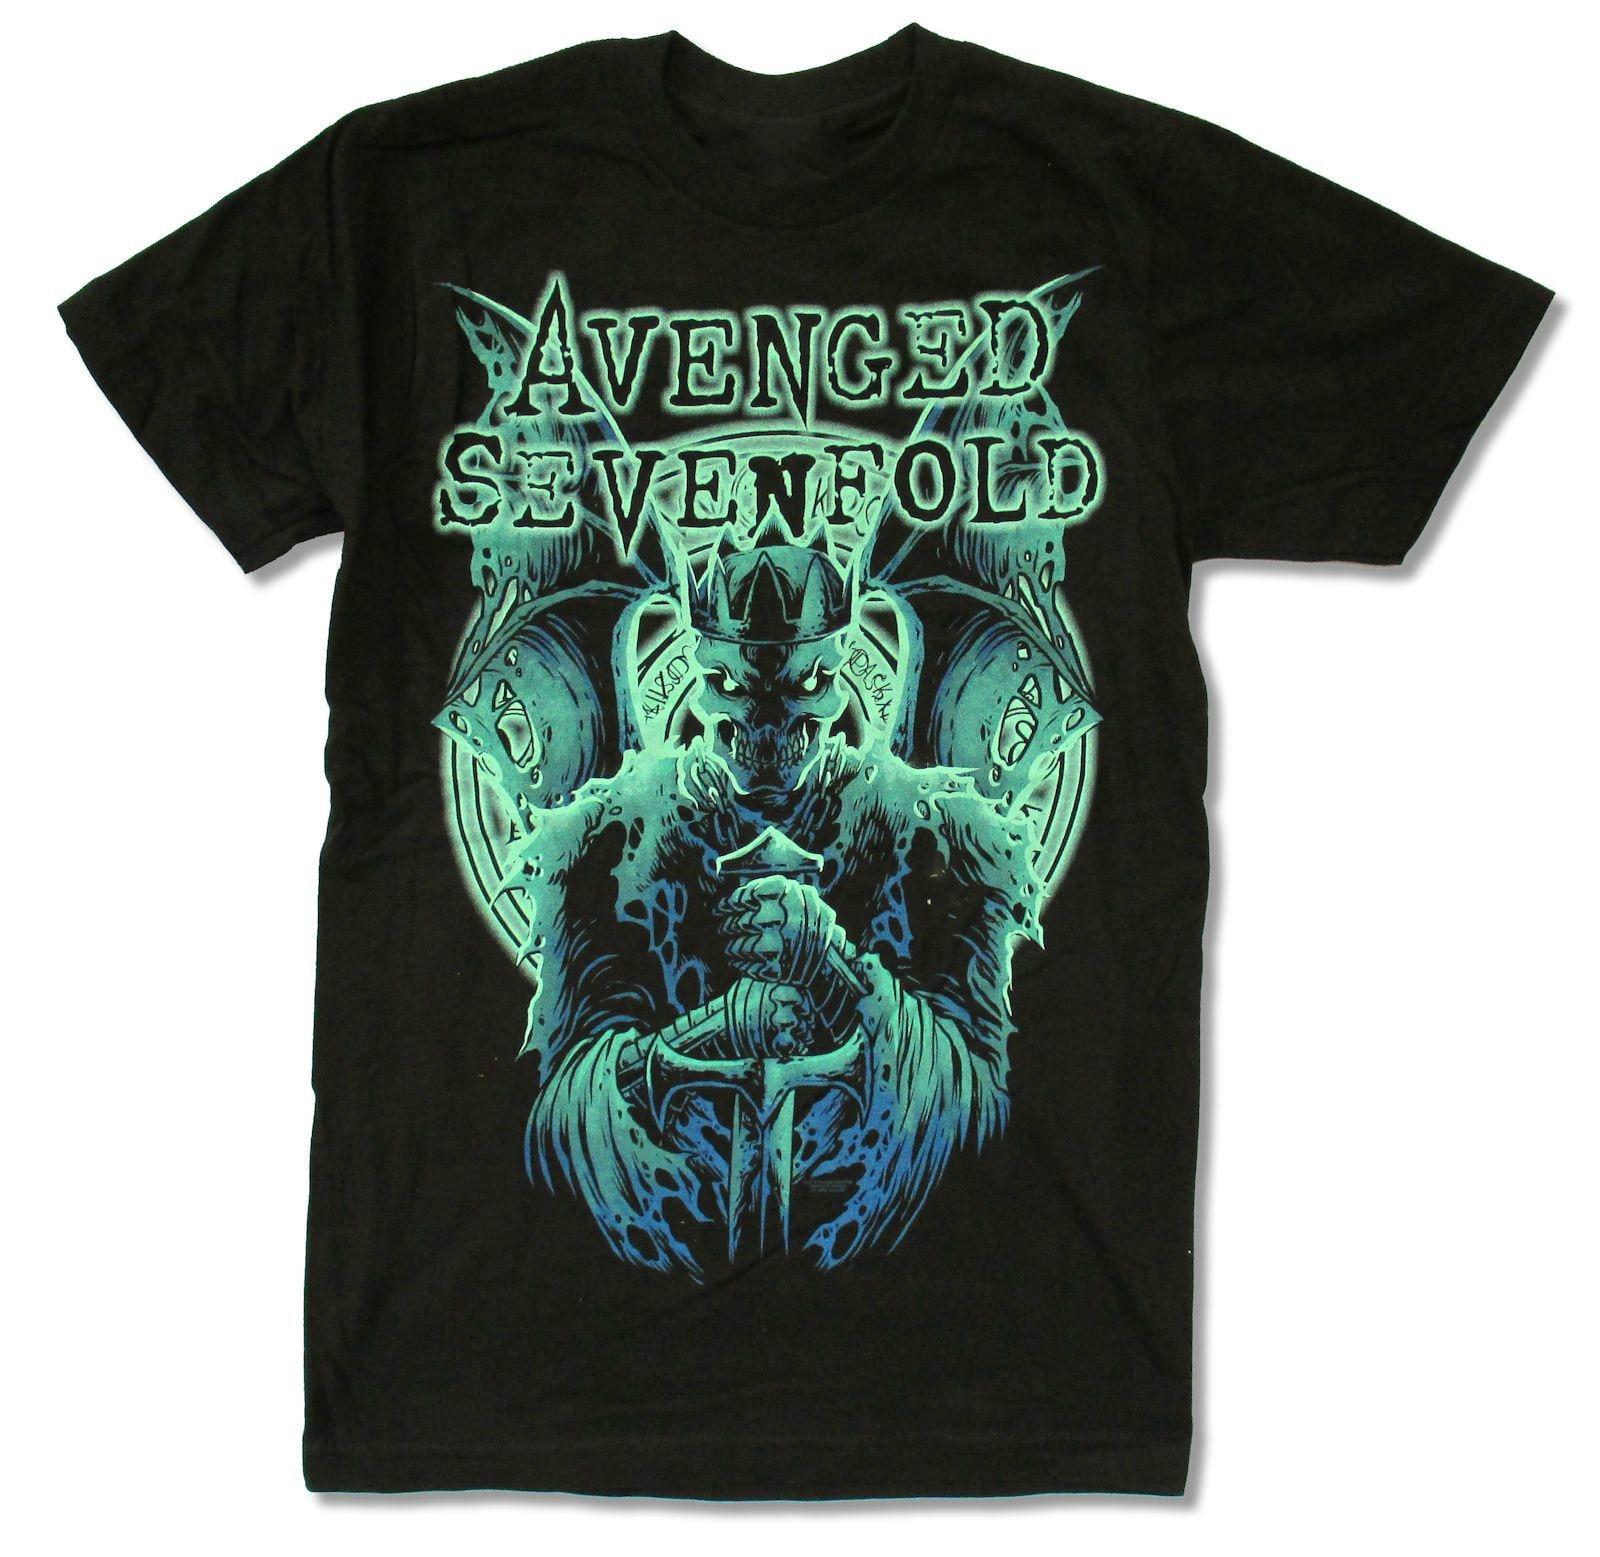 Plain black t shirt quality - Avenged Sevenfold Knight Black Slim Fit T Shirt New Official Adult A7x Plain Black T Shirt Mens